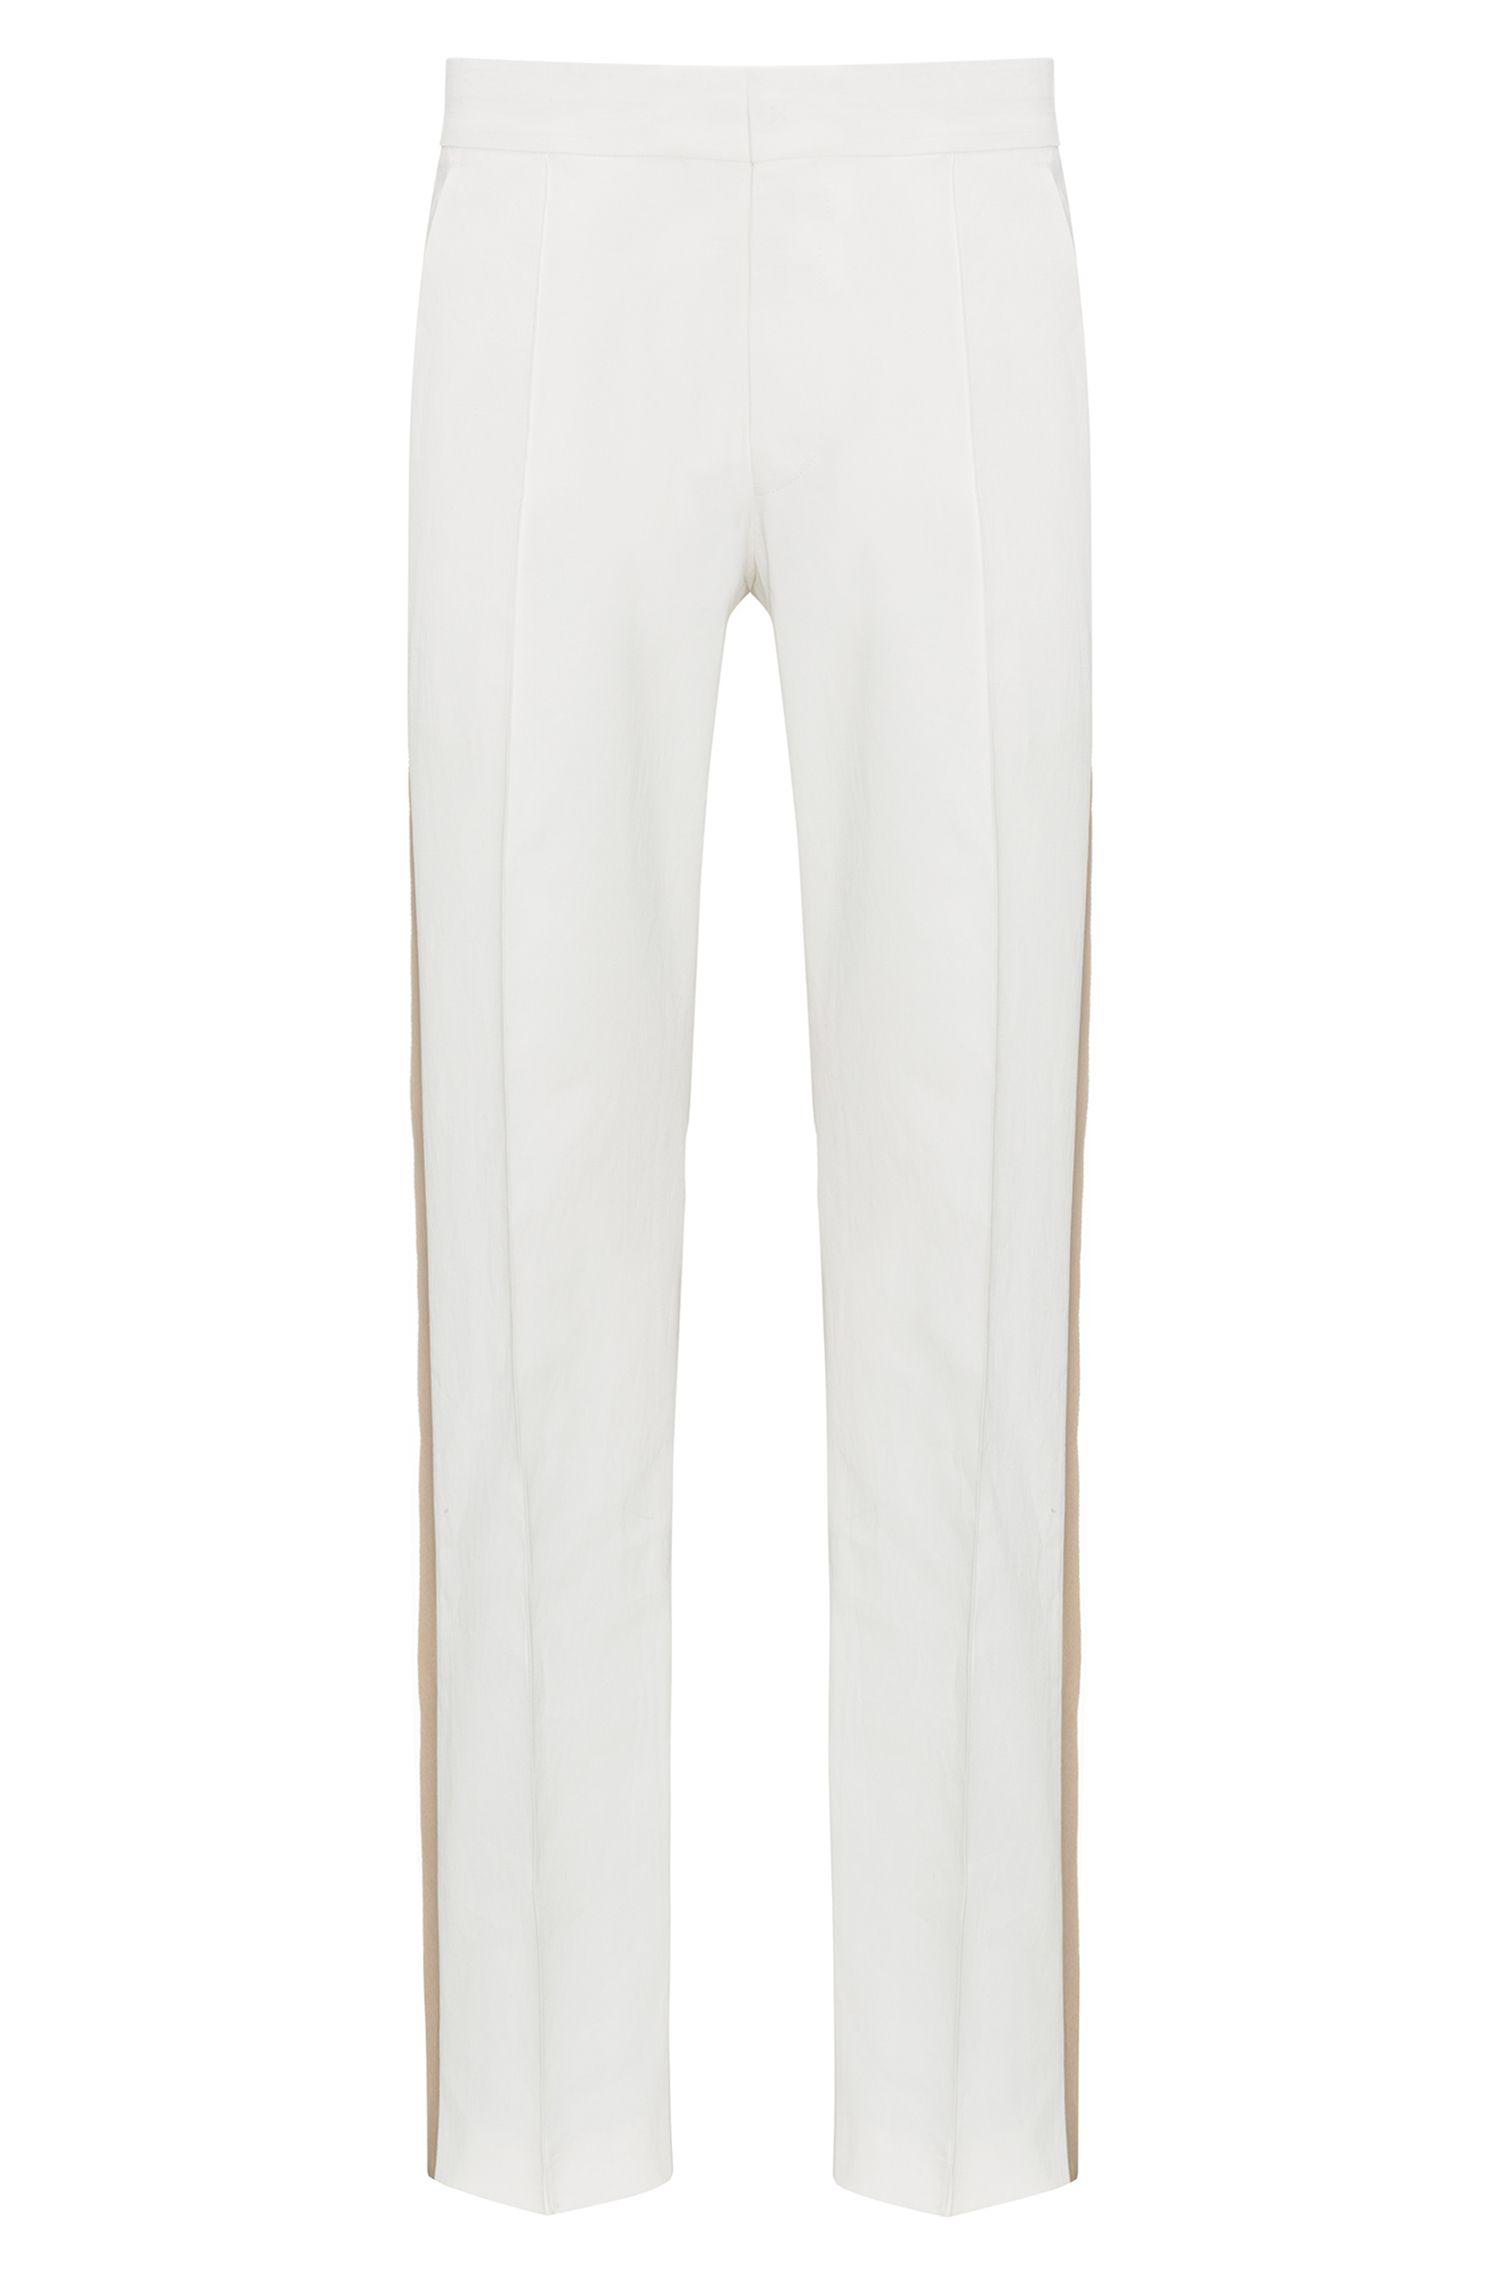 Pantalon Oversized Fit en pur lin